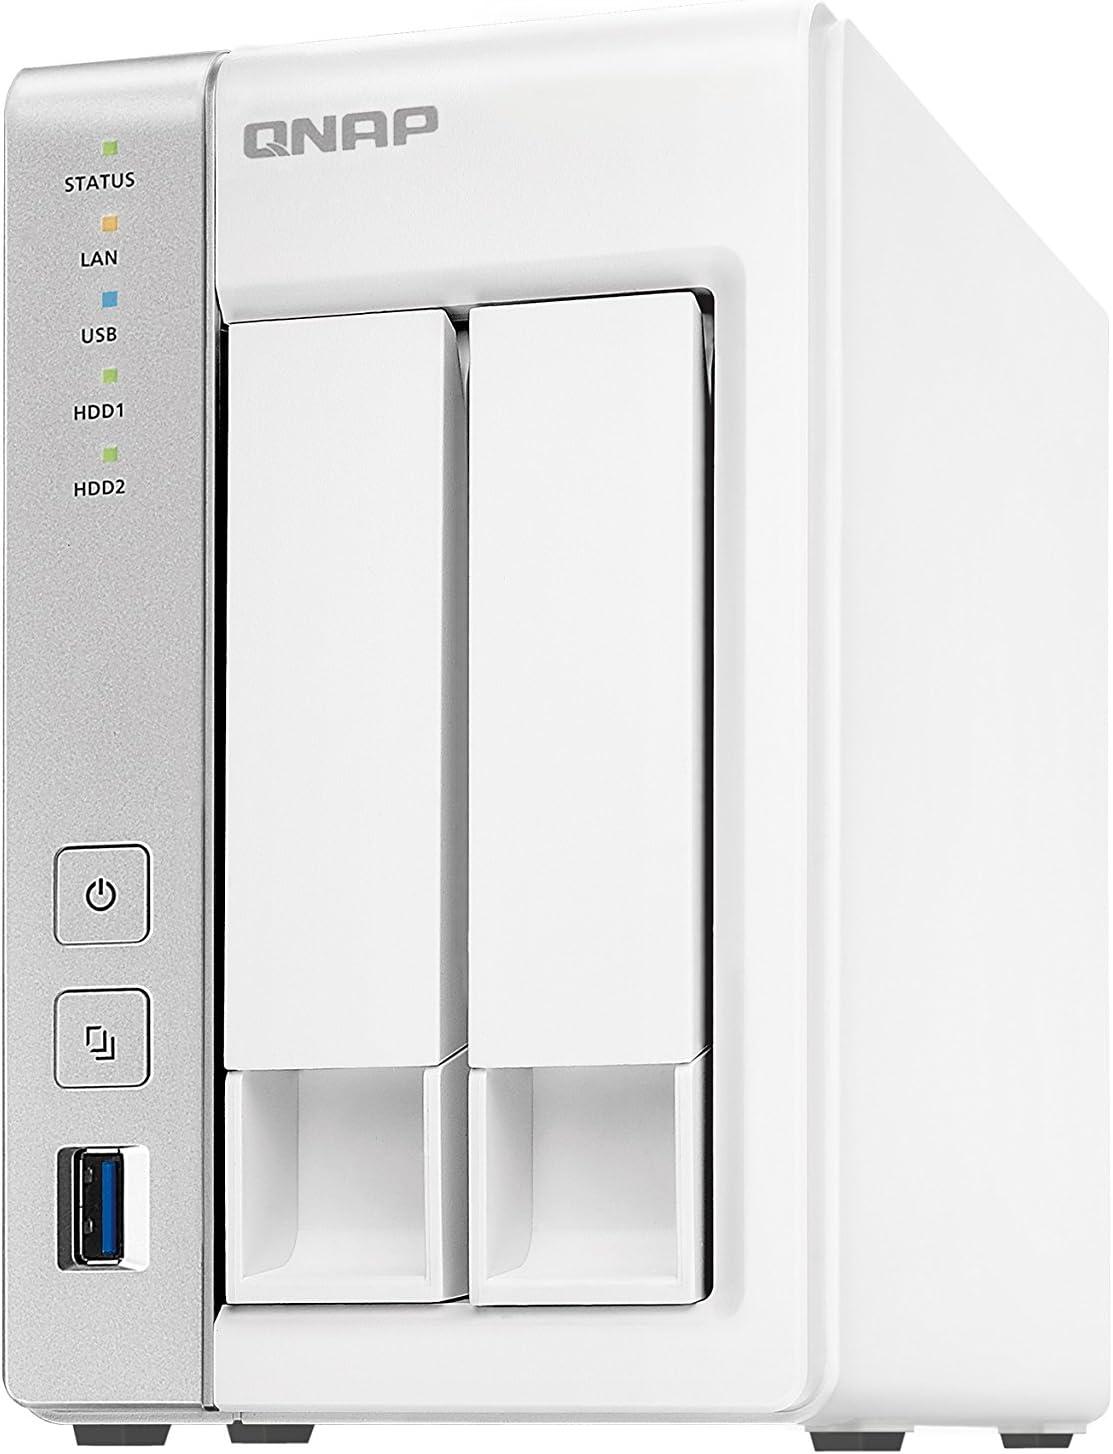 QNAP TS-231P Ethernet Torre Gris, Blanco NAS - Unidad Raid (16 TB, Unidad de Disco Duro, Unidad de Disco Duro, SSD, 8000 GB, Serial ATA II,Serial ATA III, 2.5,3.5